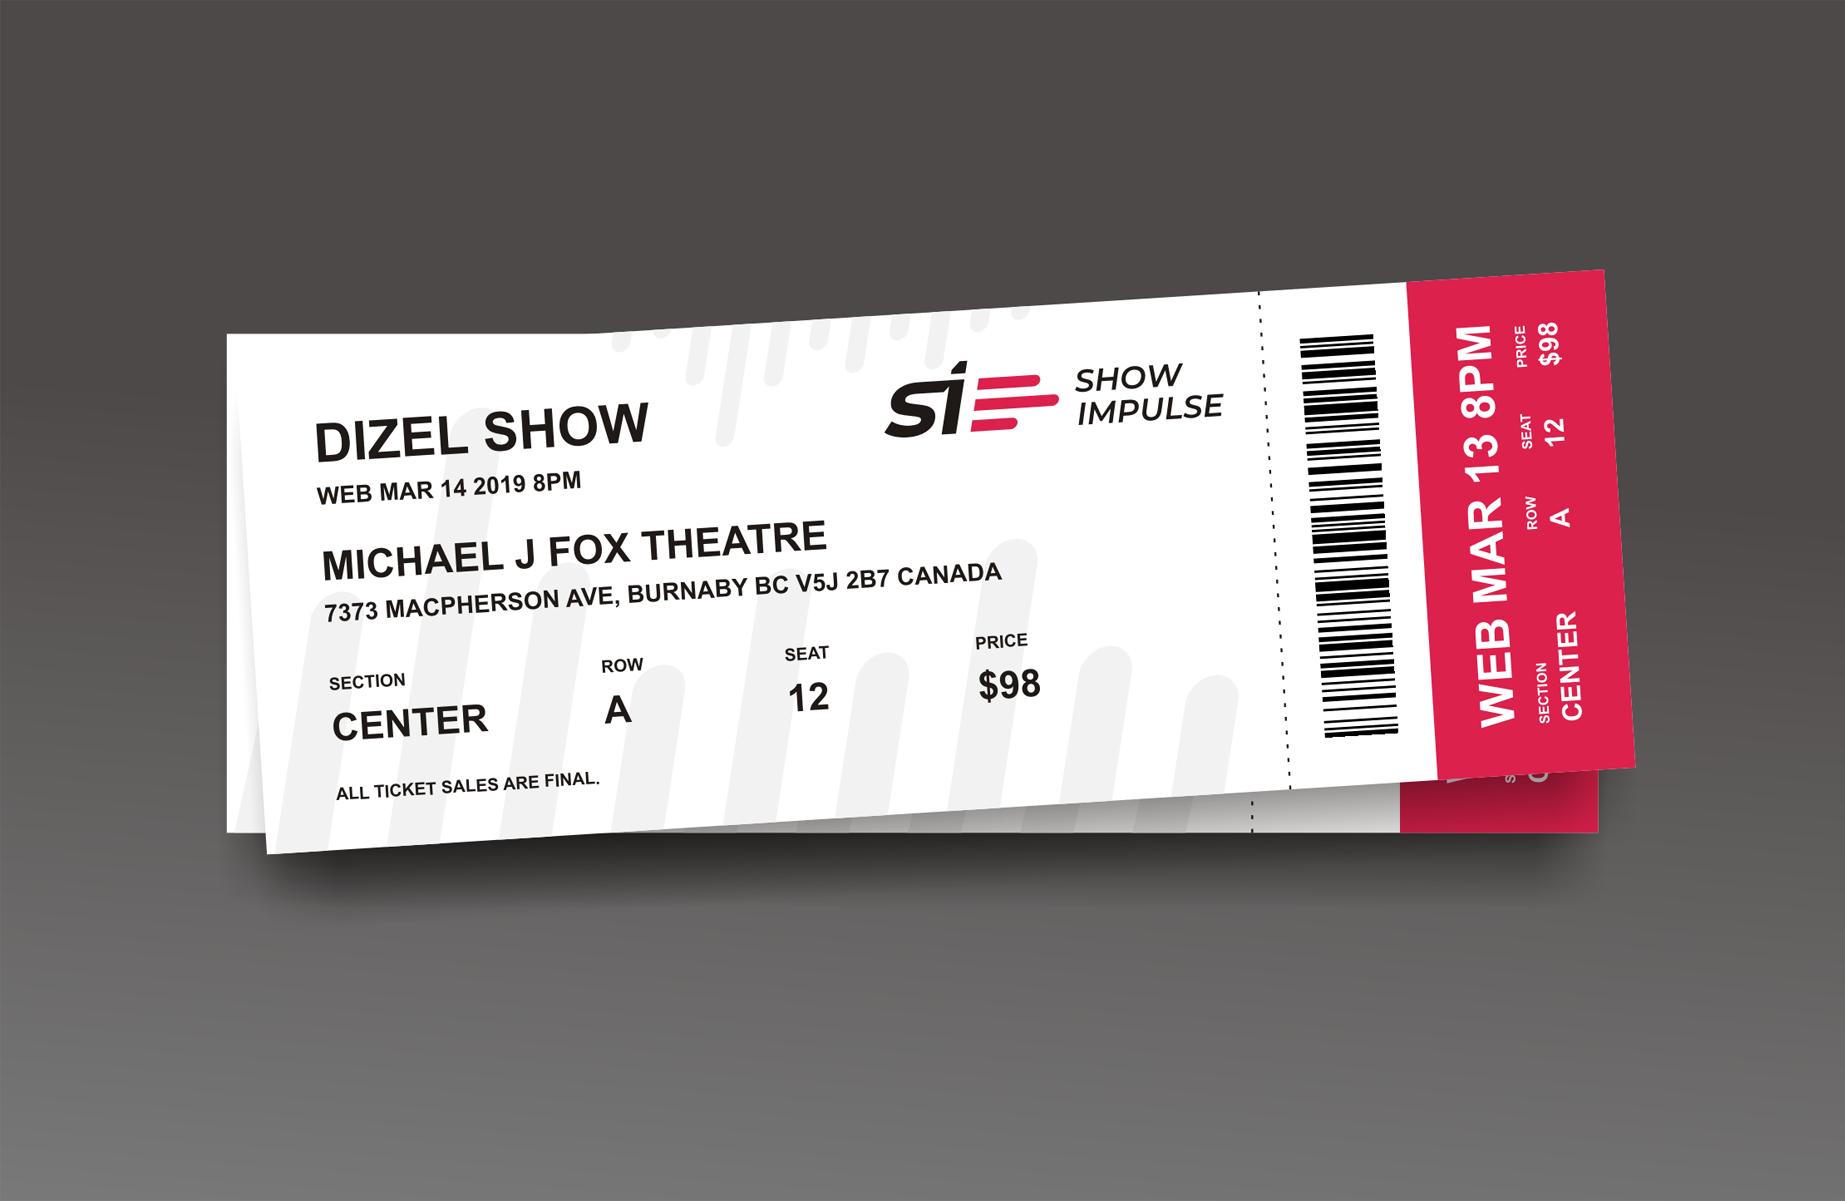 ShowImpulse билет